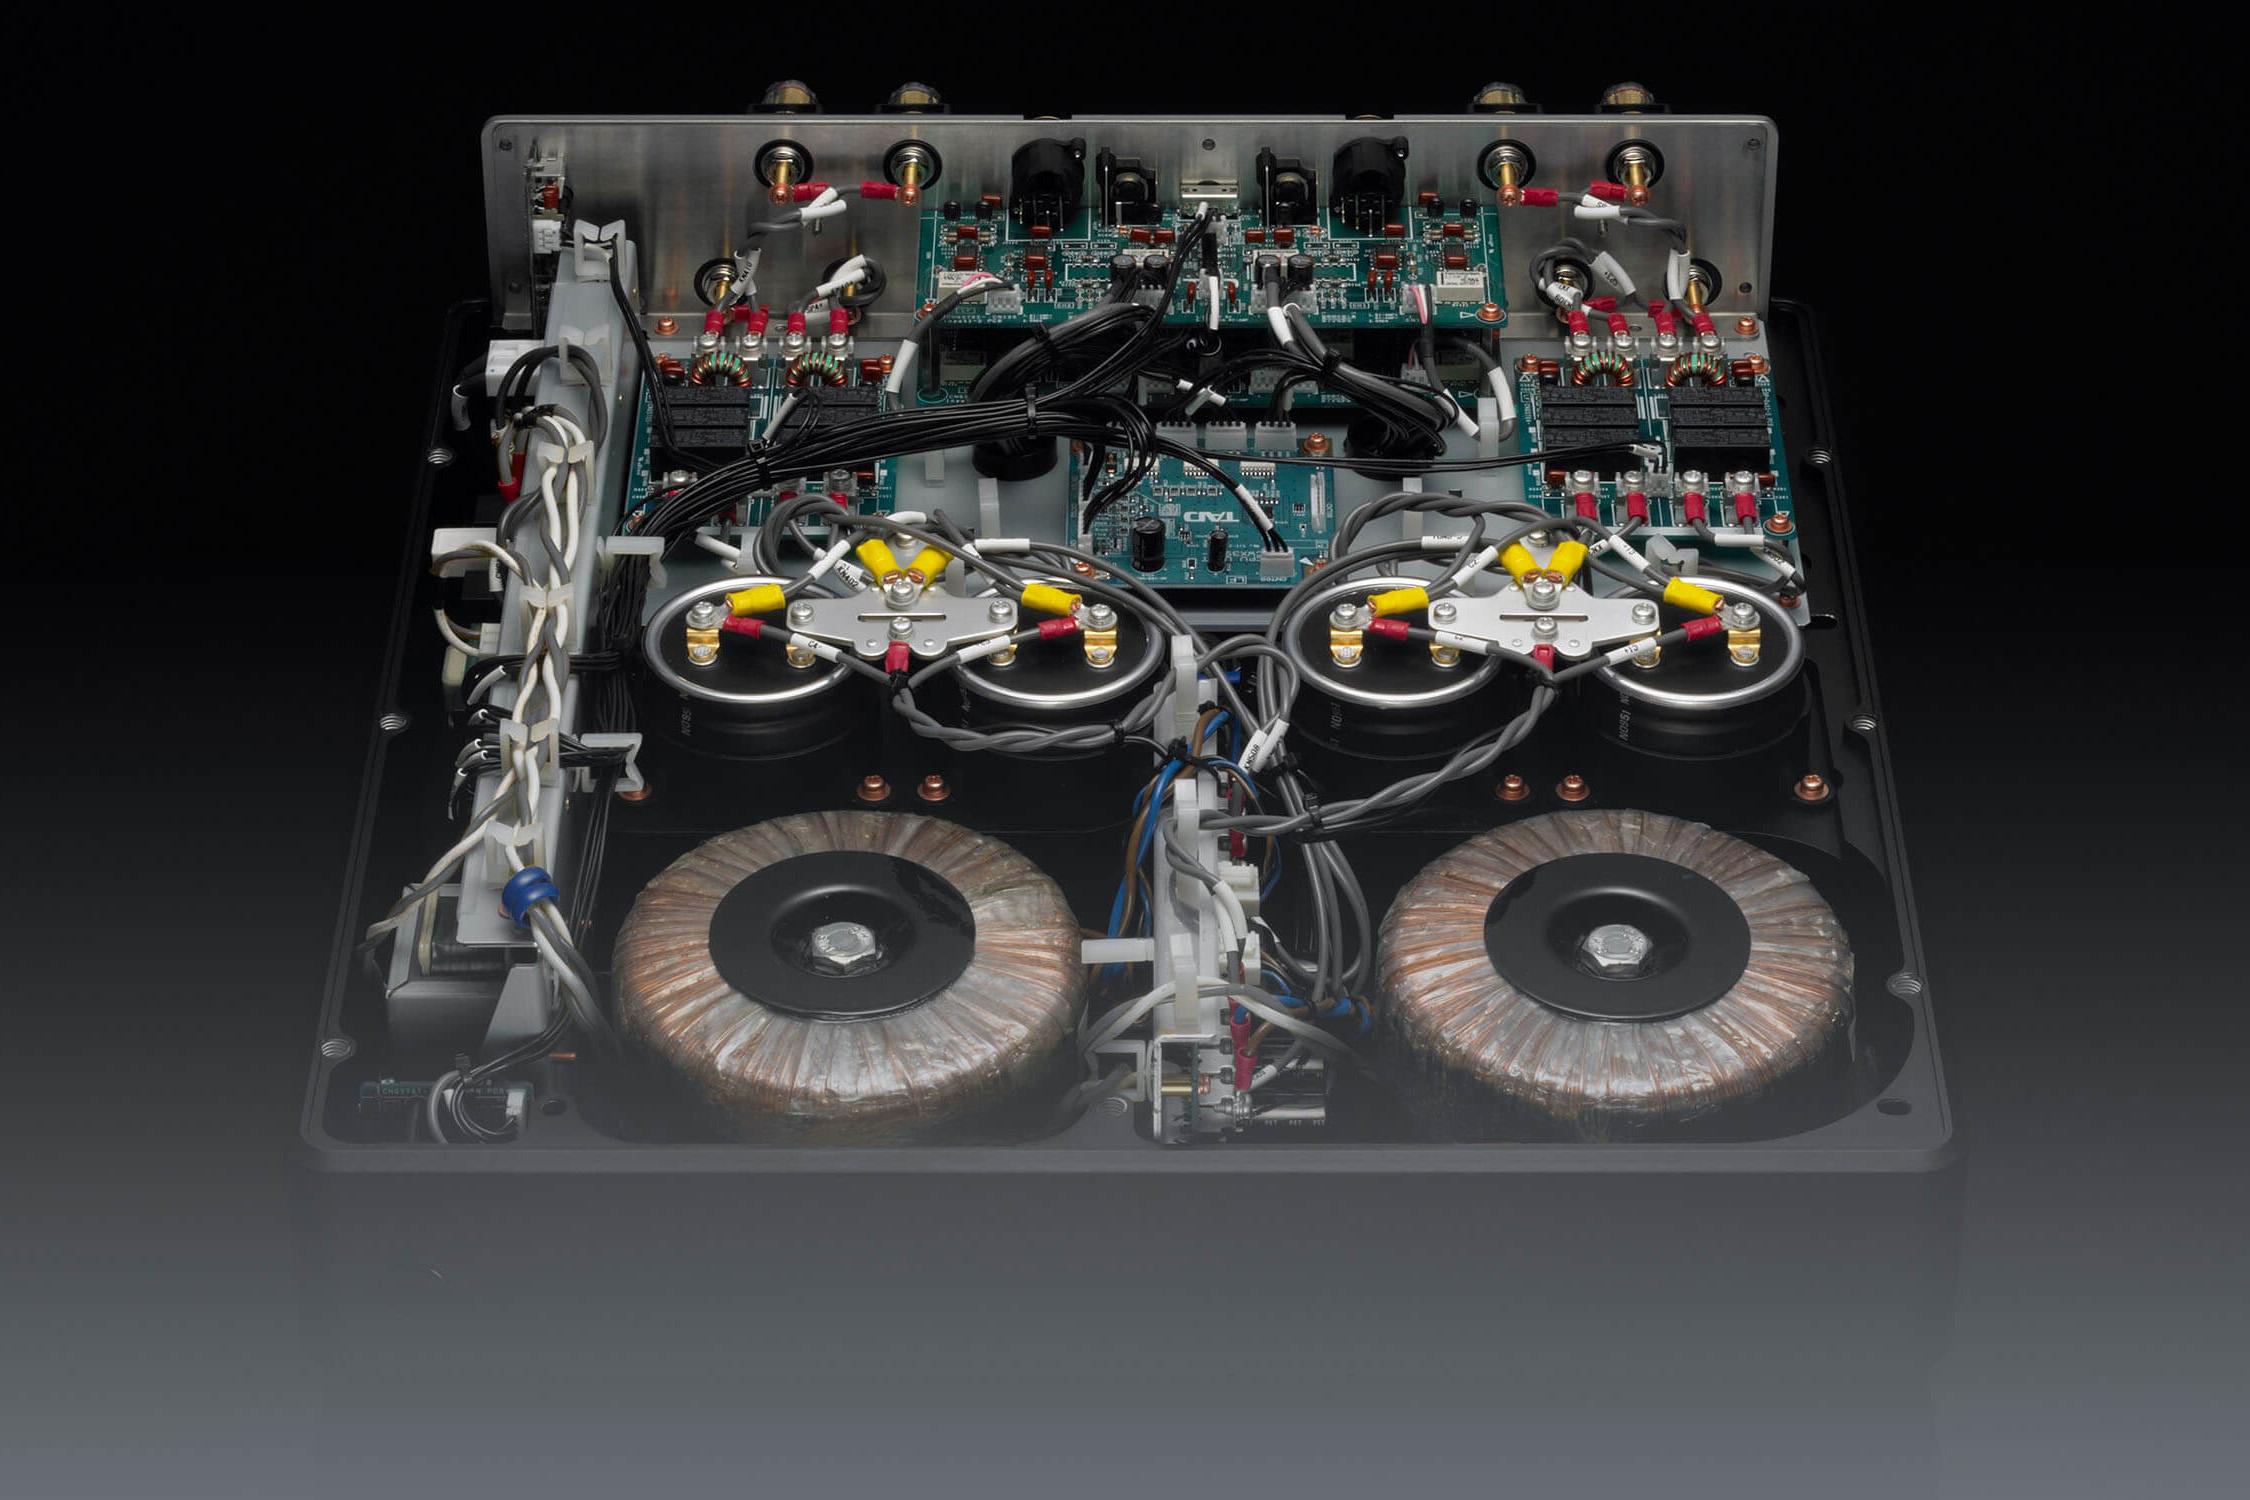 tad-m2500-power-amplifier.jpg